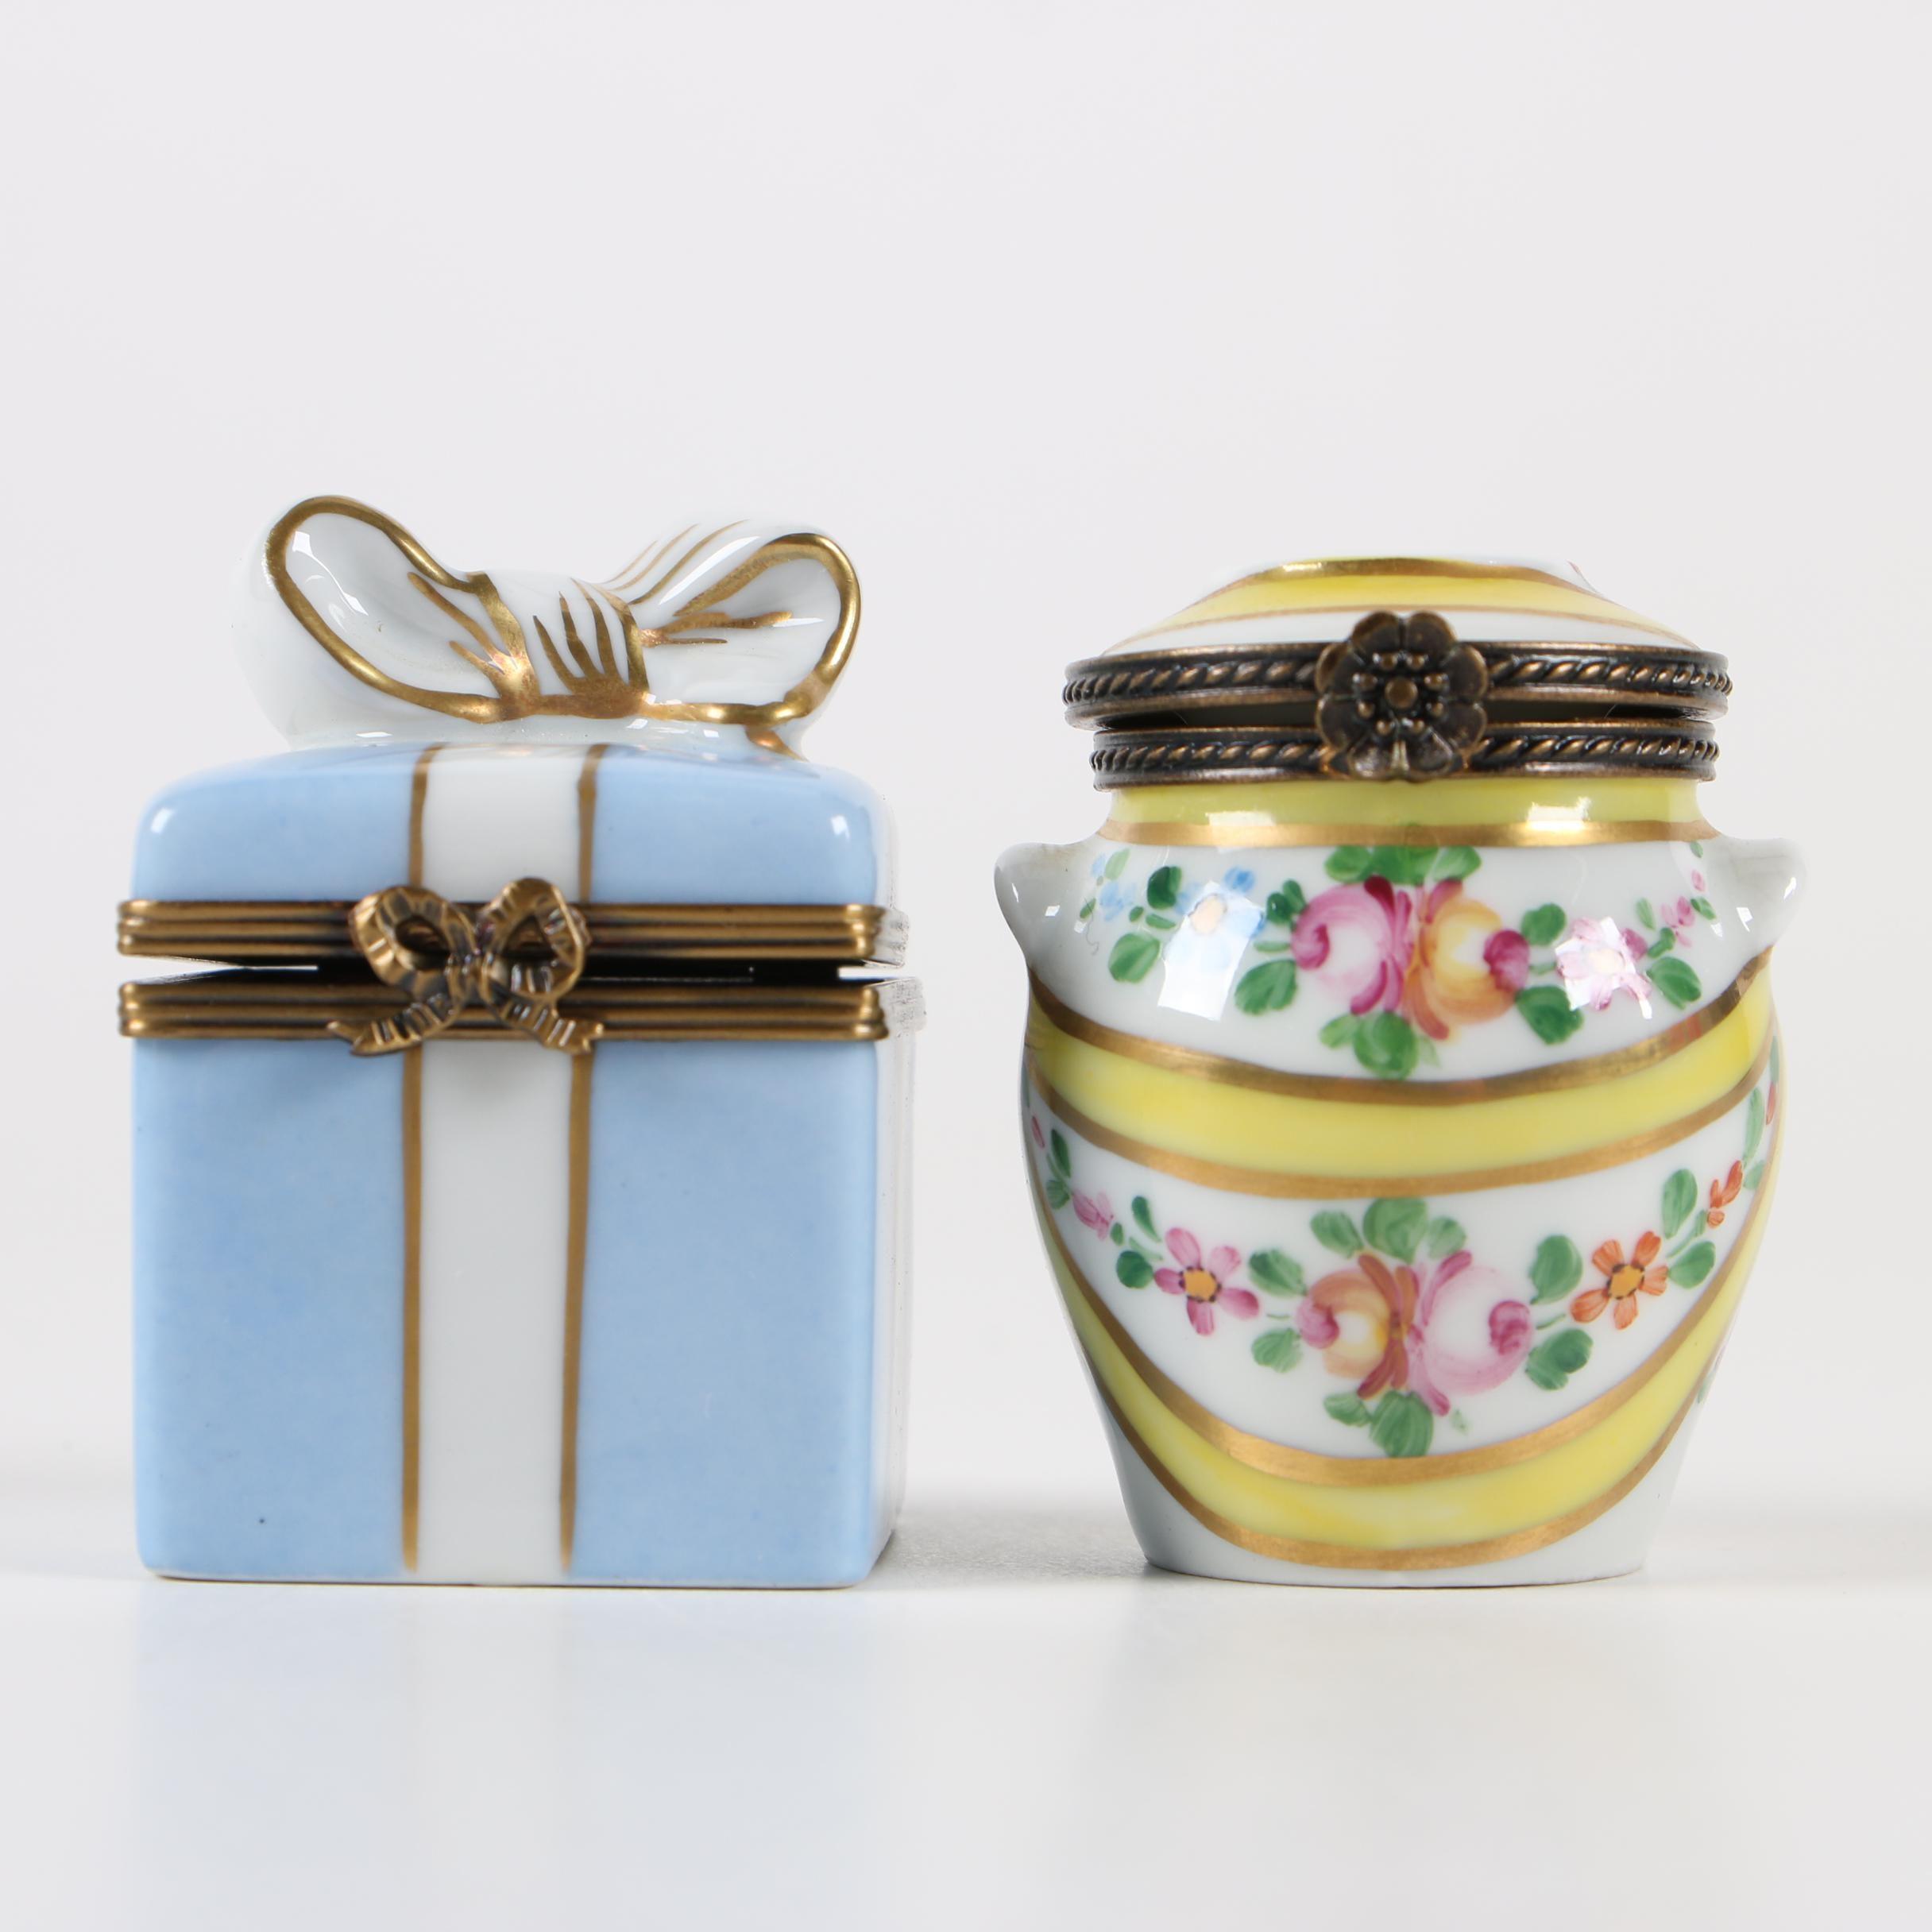 Hand-Painted Limoges Porcelain Trinket Boxes